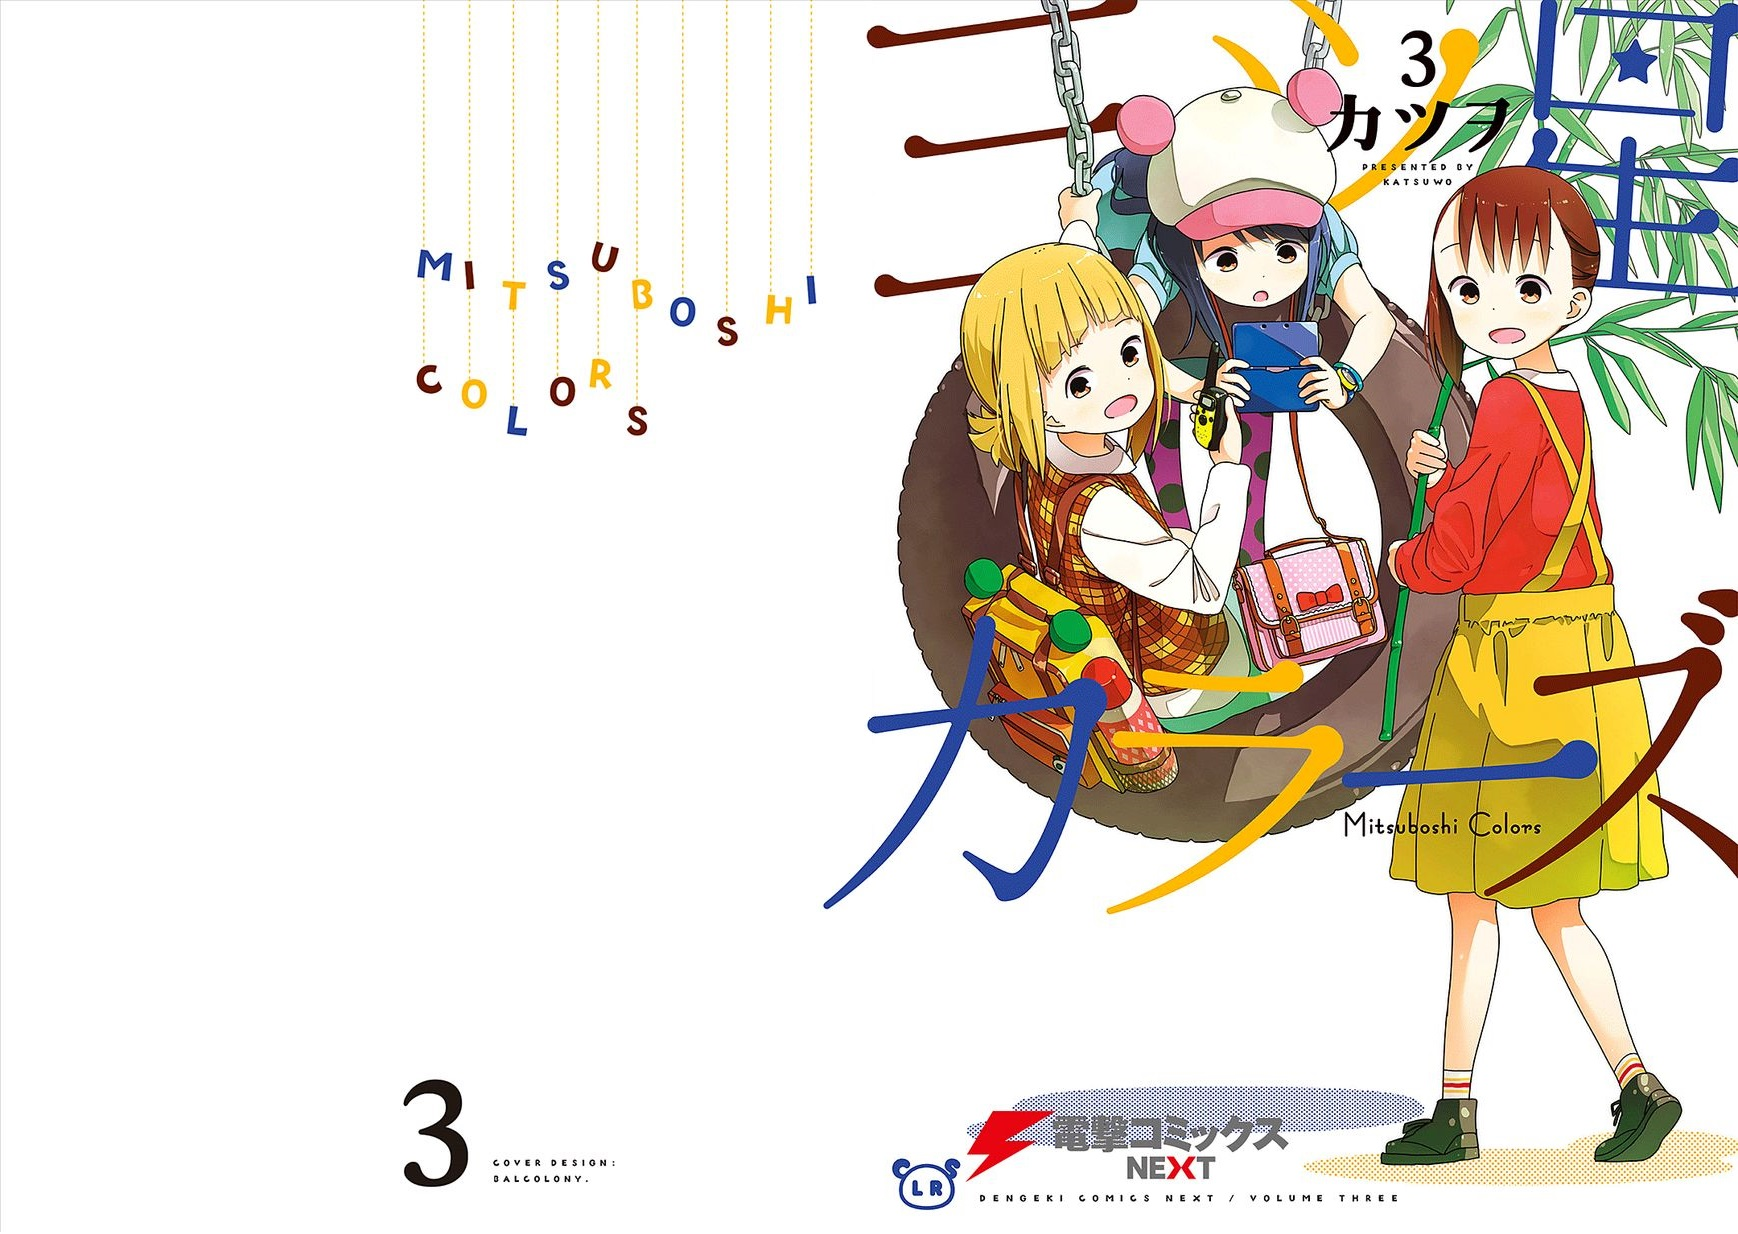 https://nine.mangadogs.com/fr_manga/pic1/0/1472/59104/MitsuboshiColors20VF_0_606.jpg Page 1